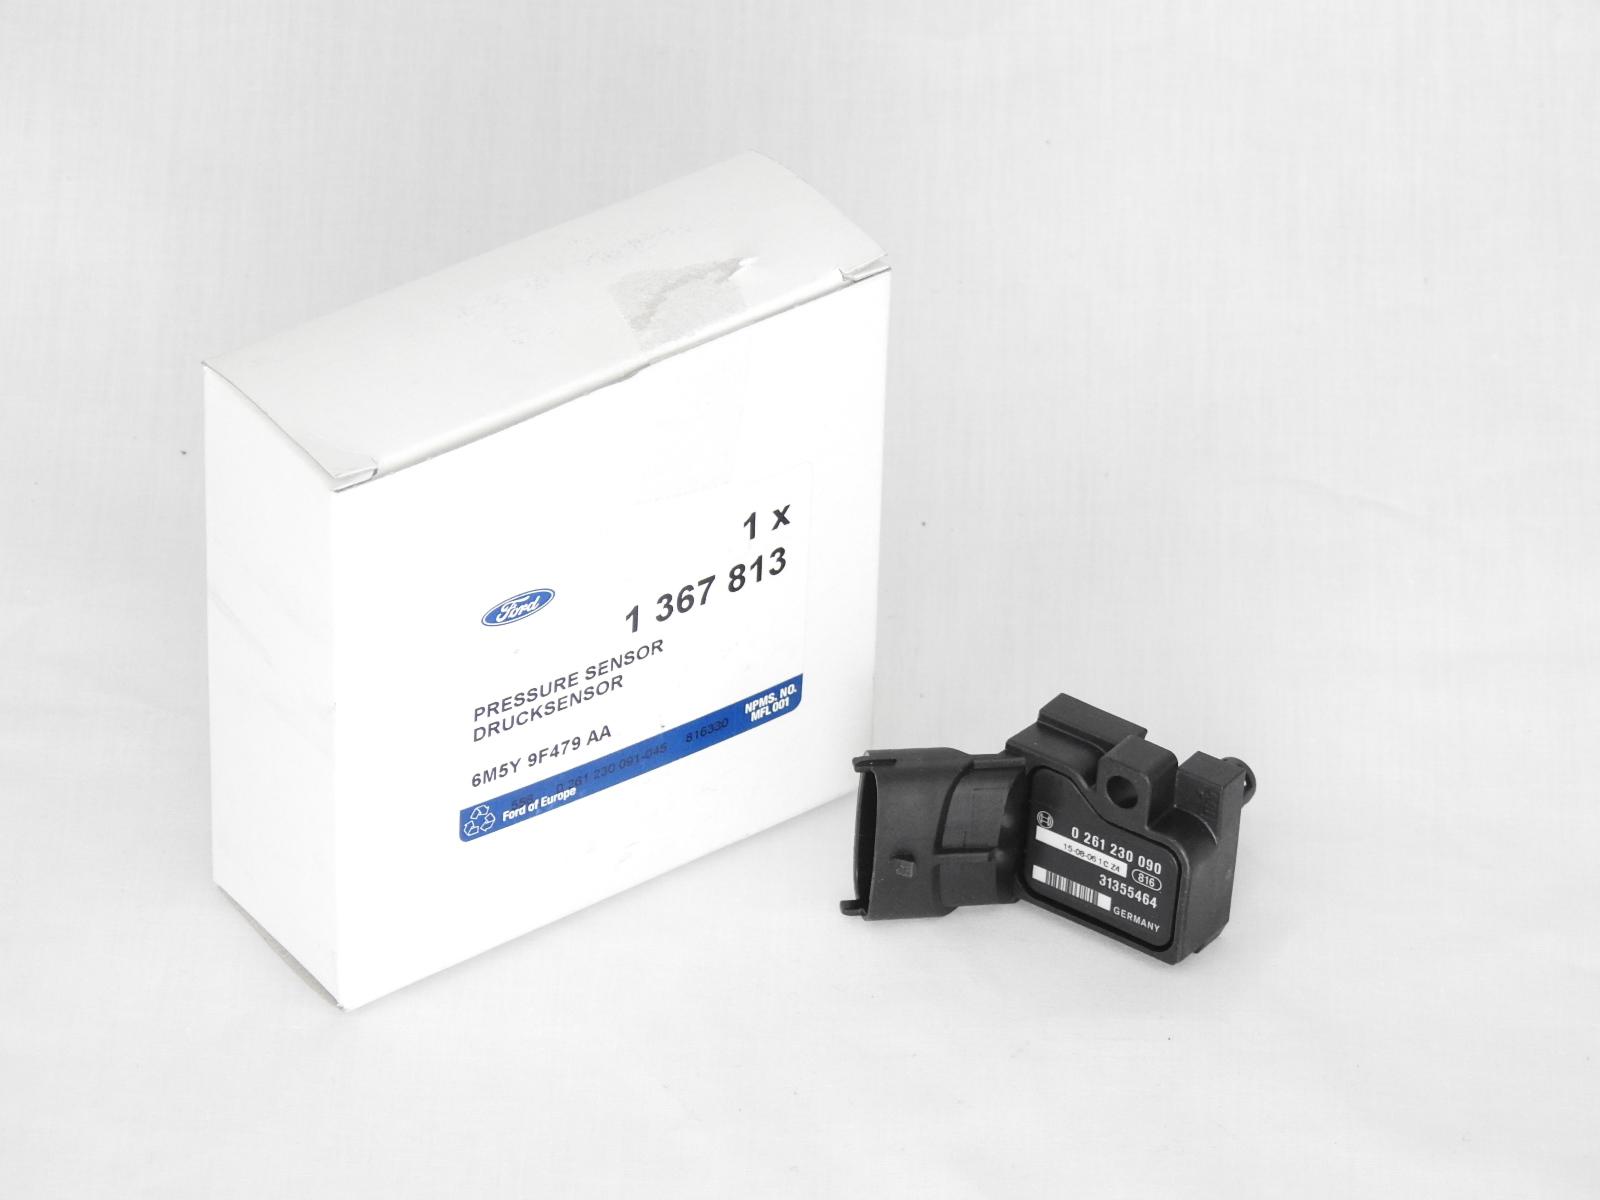 Genuine Ford Focus RS Mk2 Map Sensor